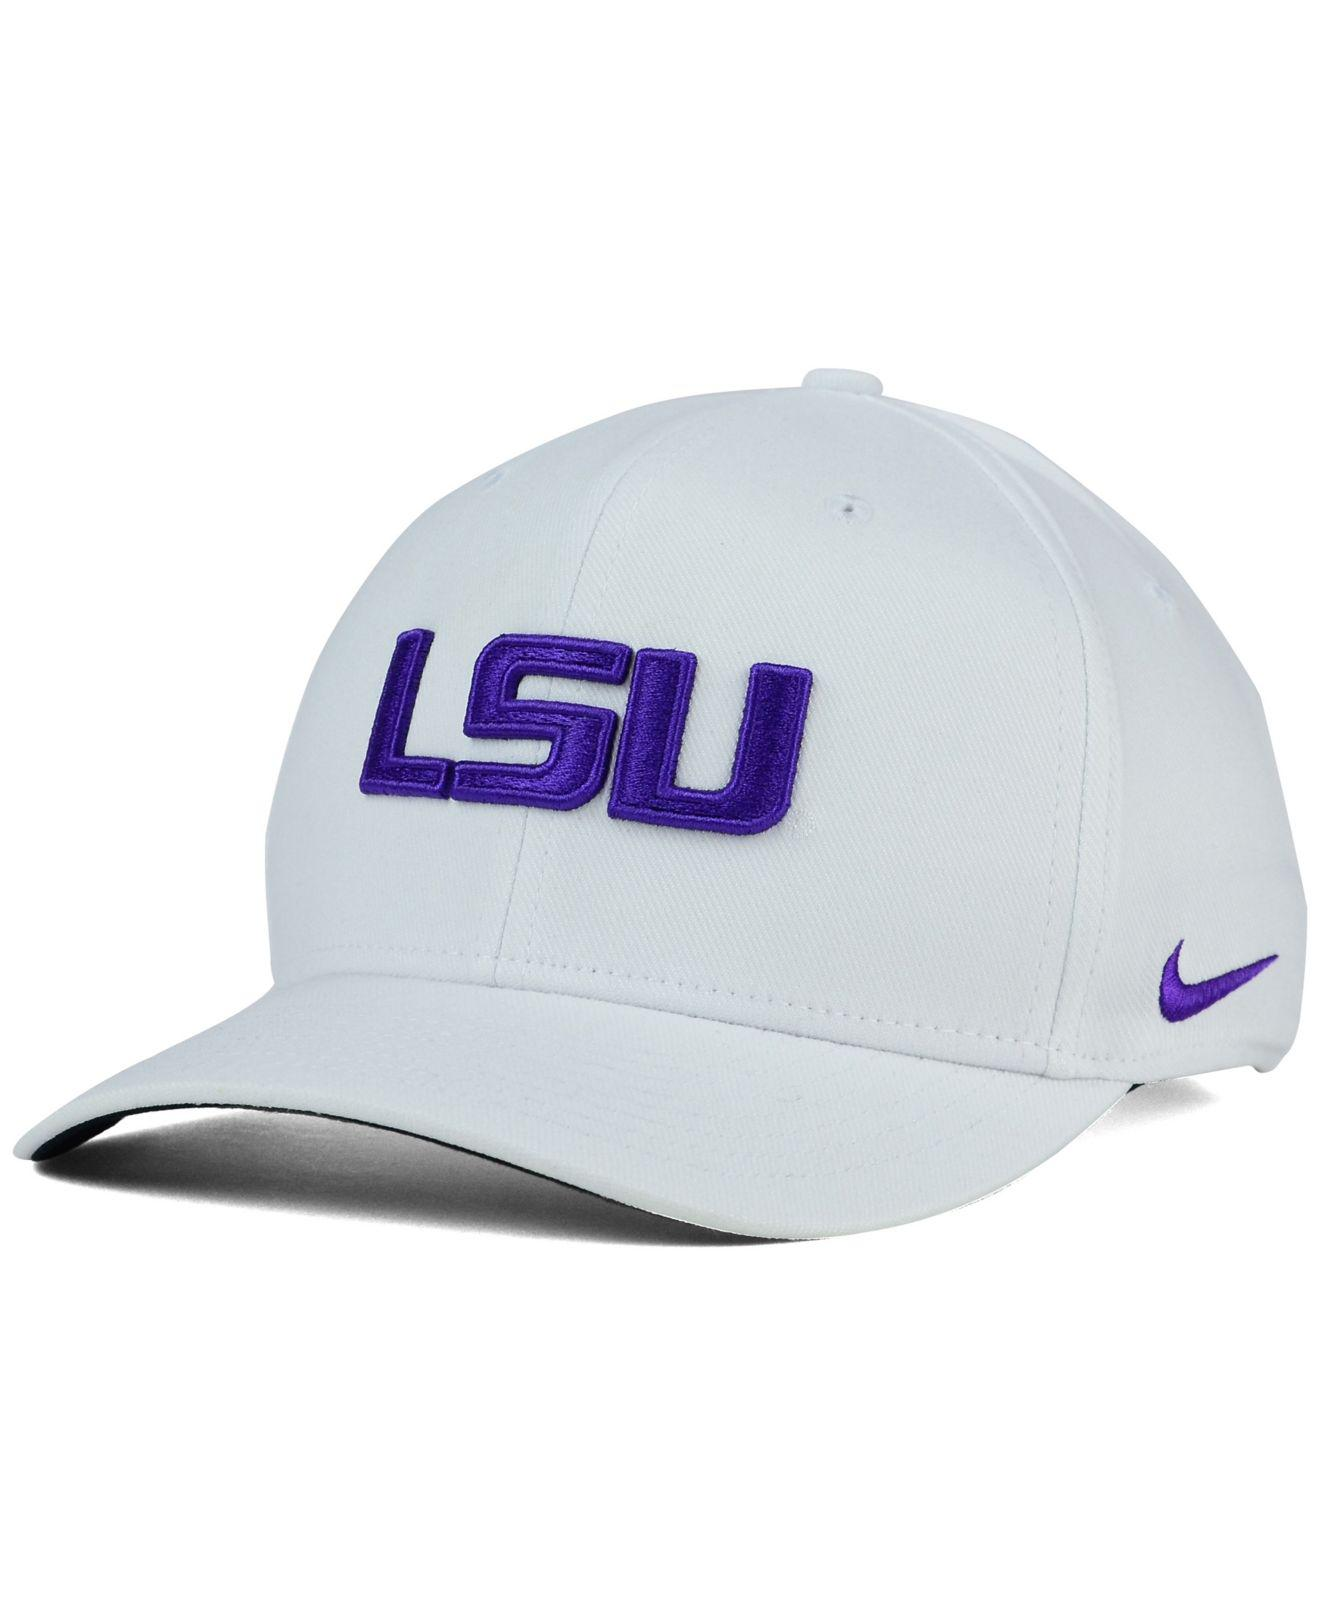 65b89bd5786c3 Lyst - Nike Lsu Tigers Classic Swoosh Cap in White for Men